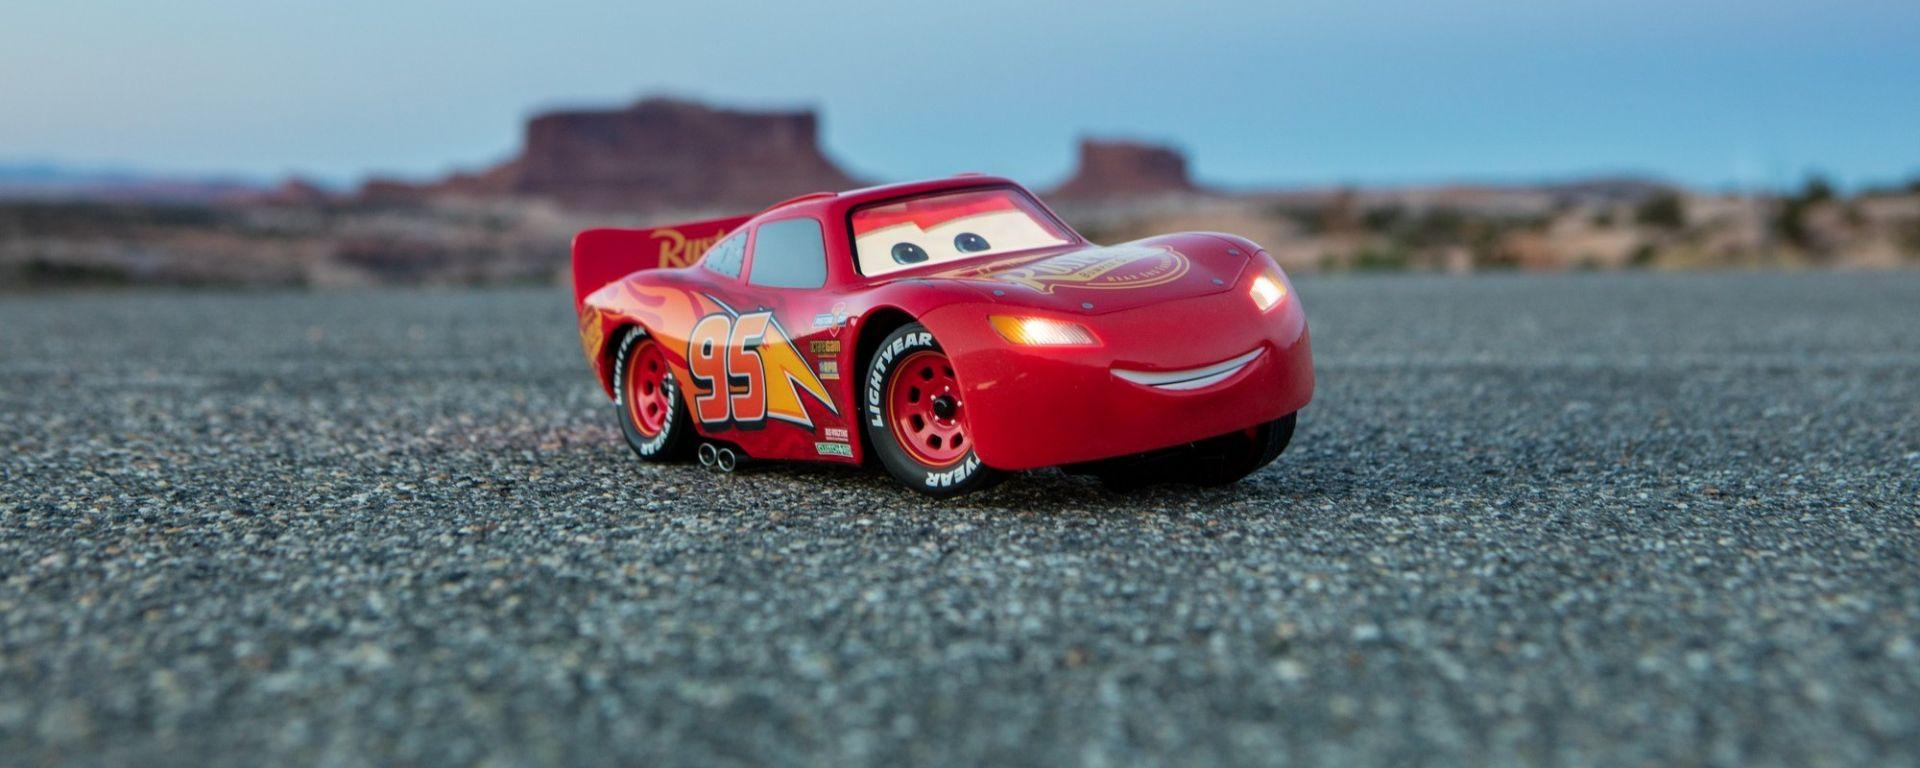 Video: Ultimate Lightning McQueen by Sphero: Saetta di Cars prende vita - MotorBox